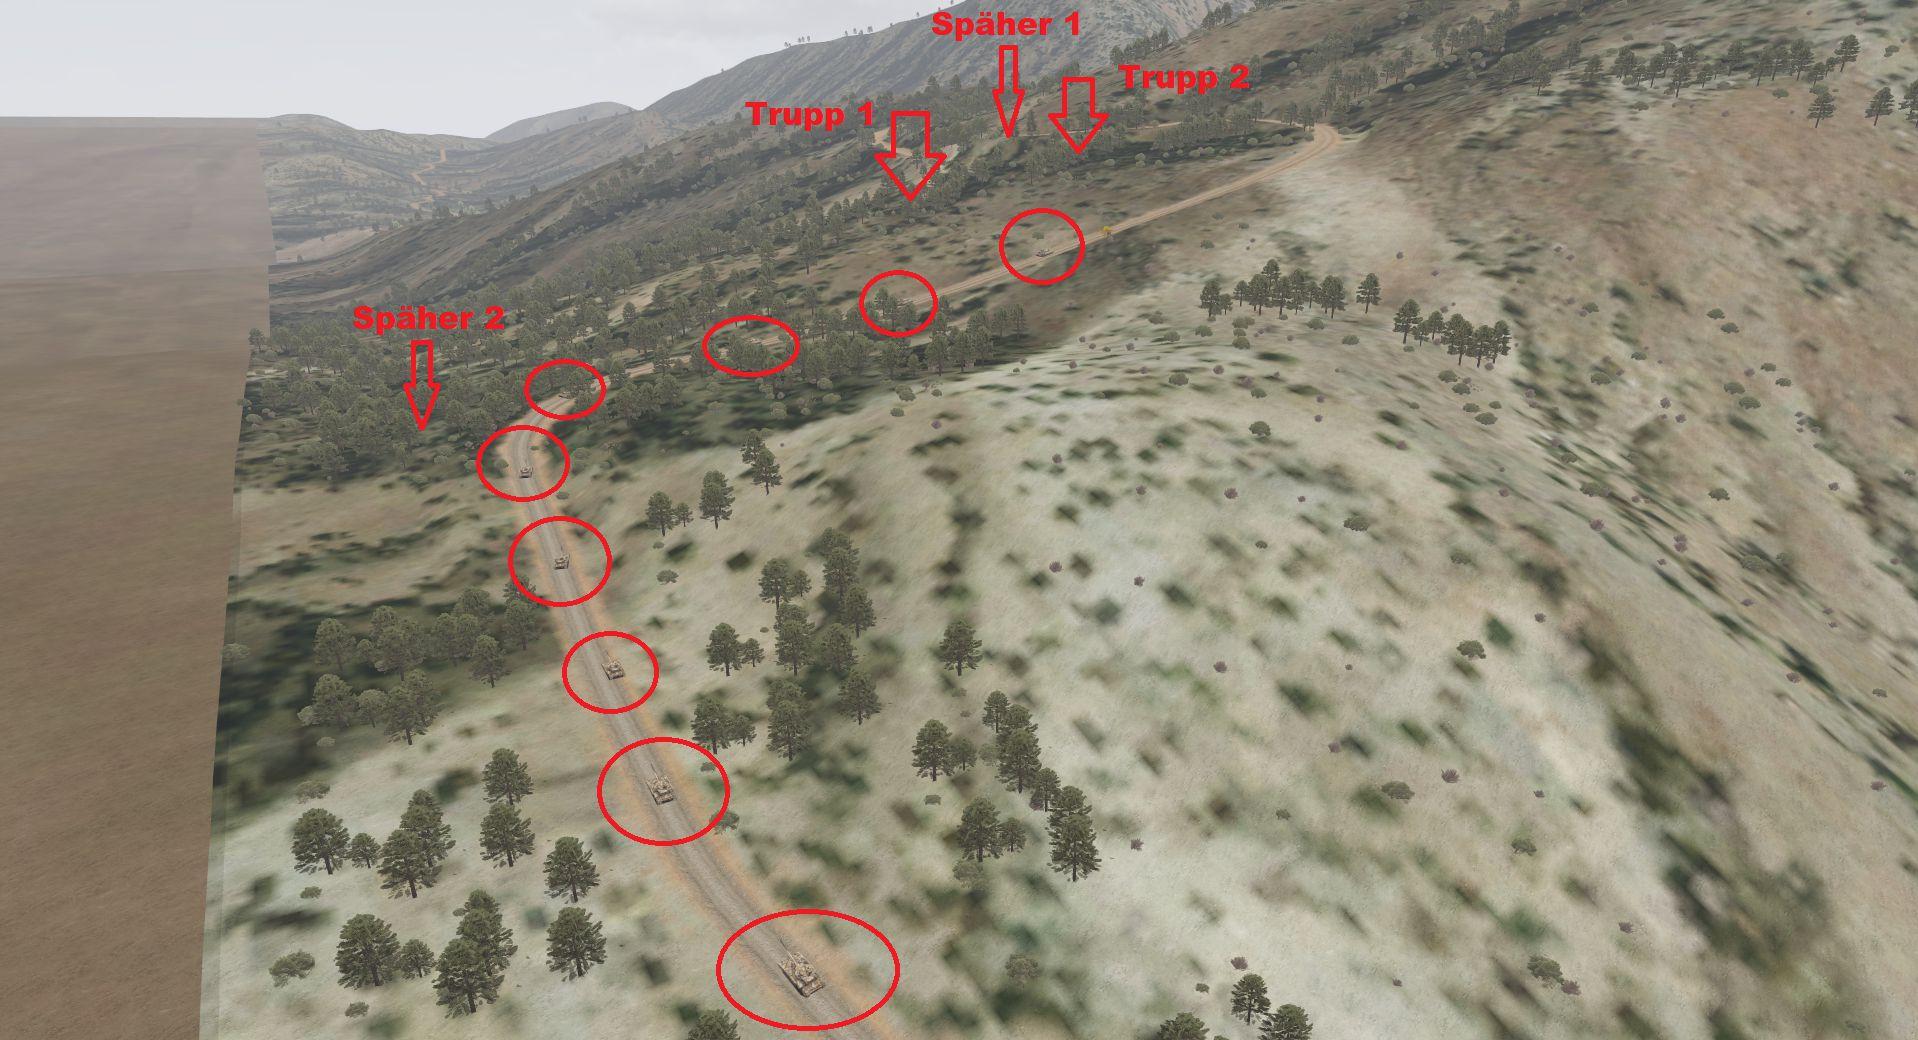 i.epvpimg.com/f7Sjeab.jpg